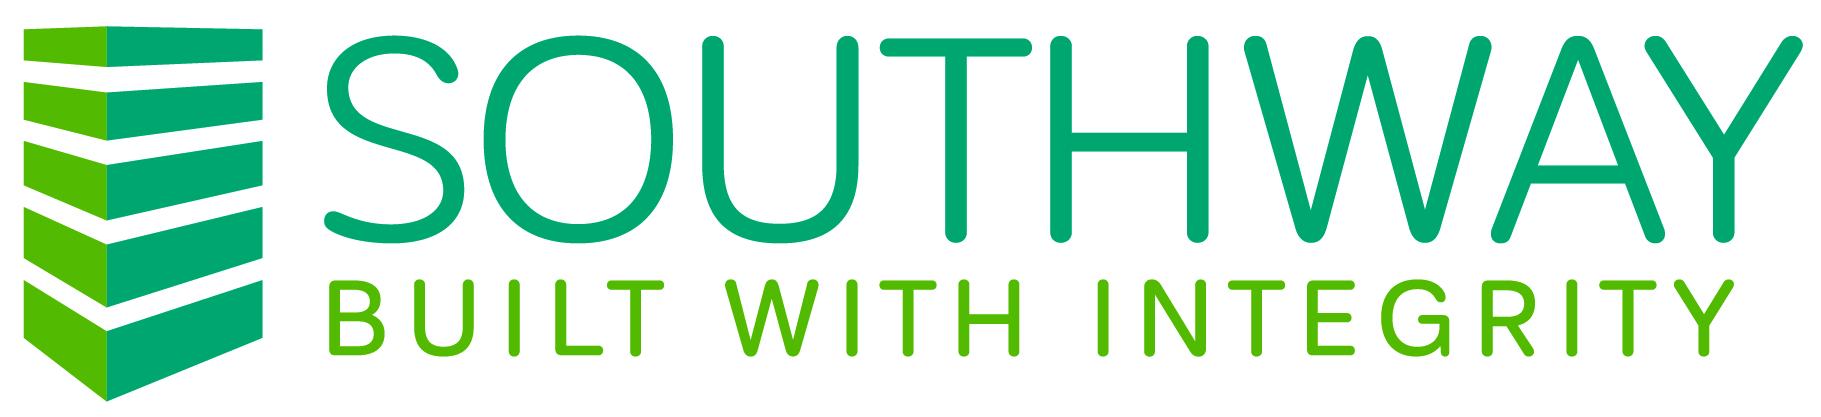 Southway Builders logo